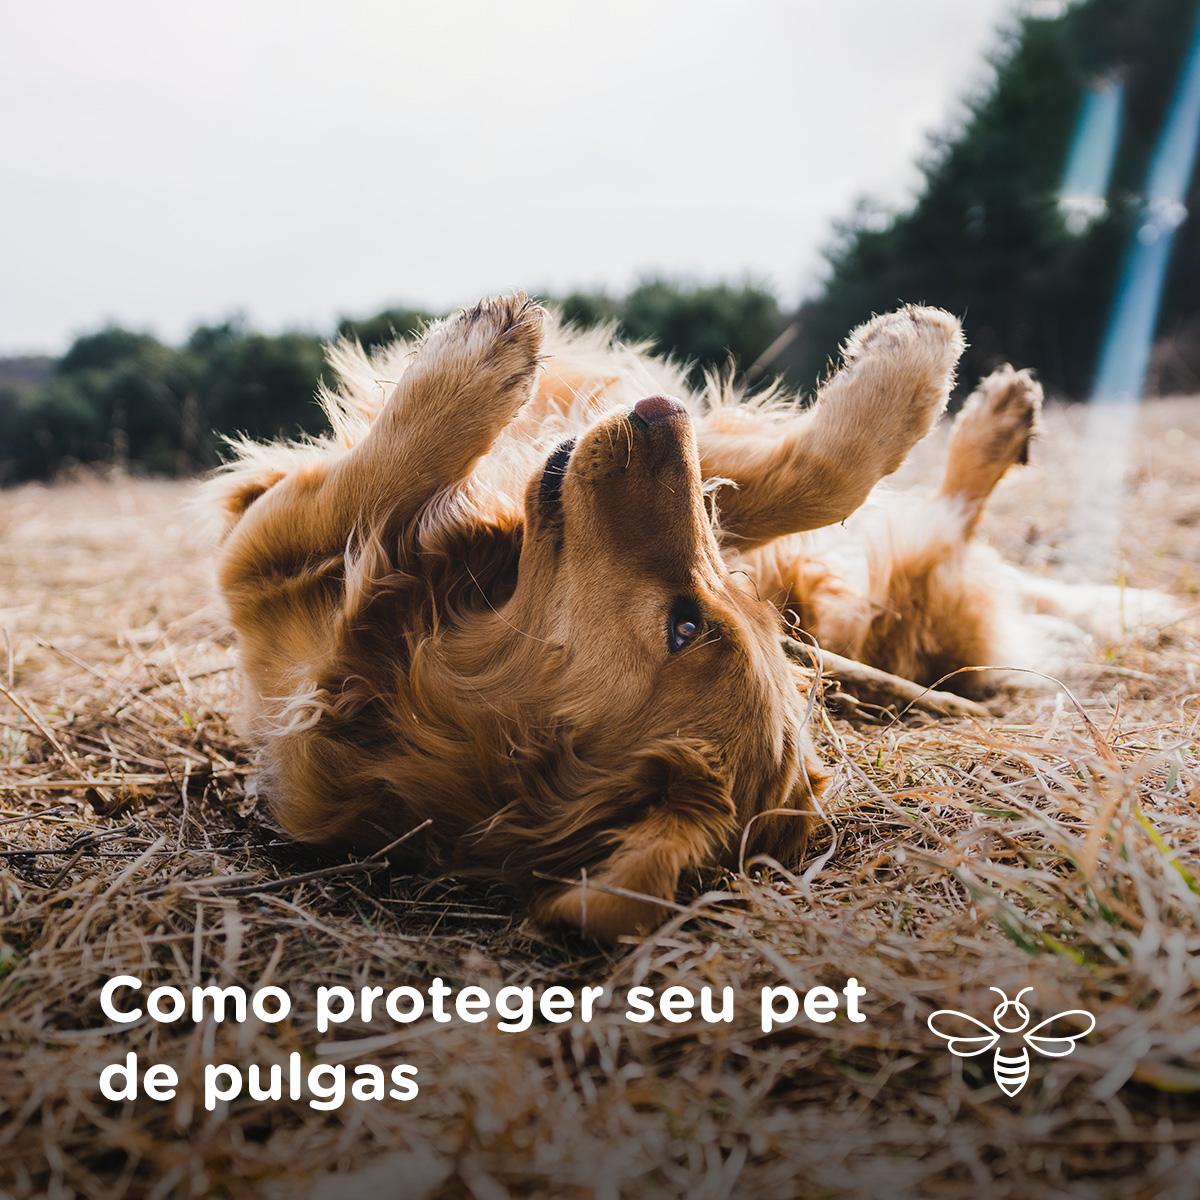 Como proteger seu pet de pulgas